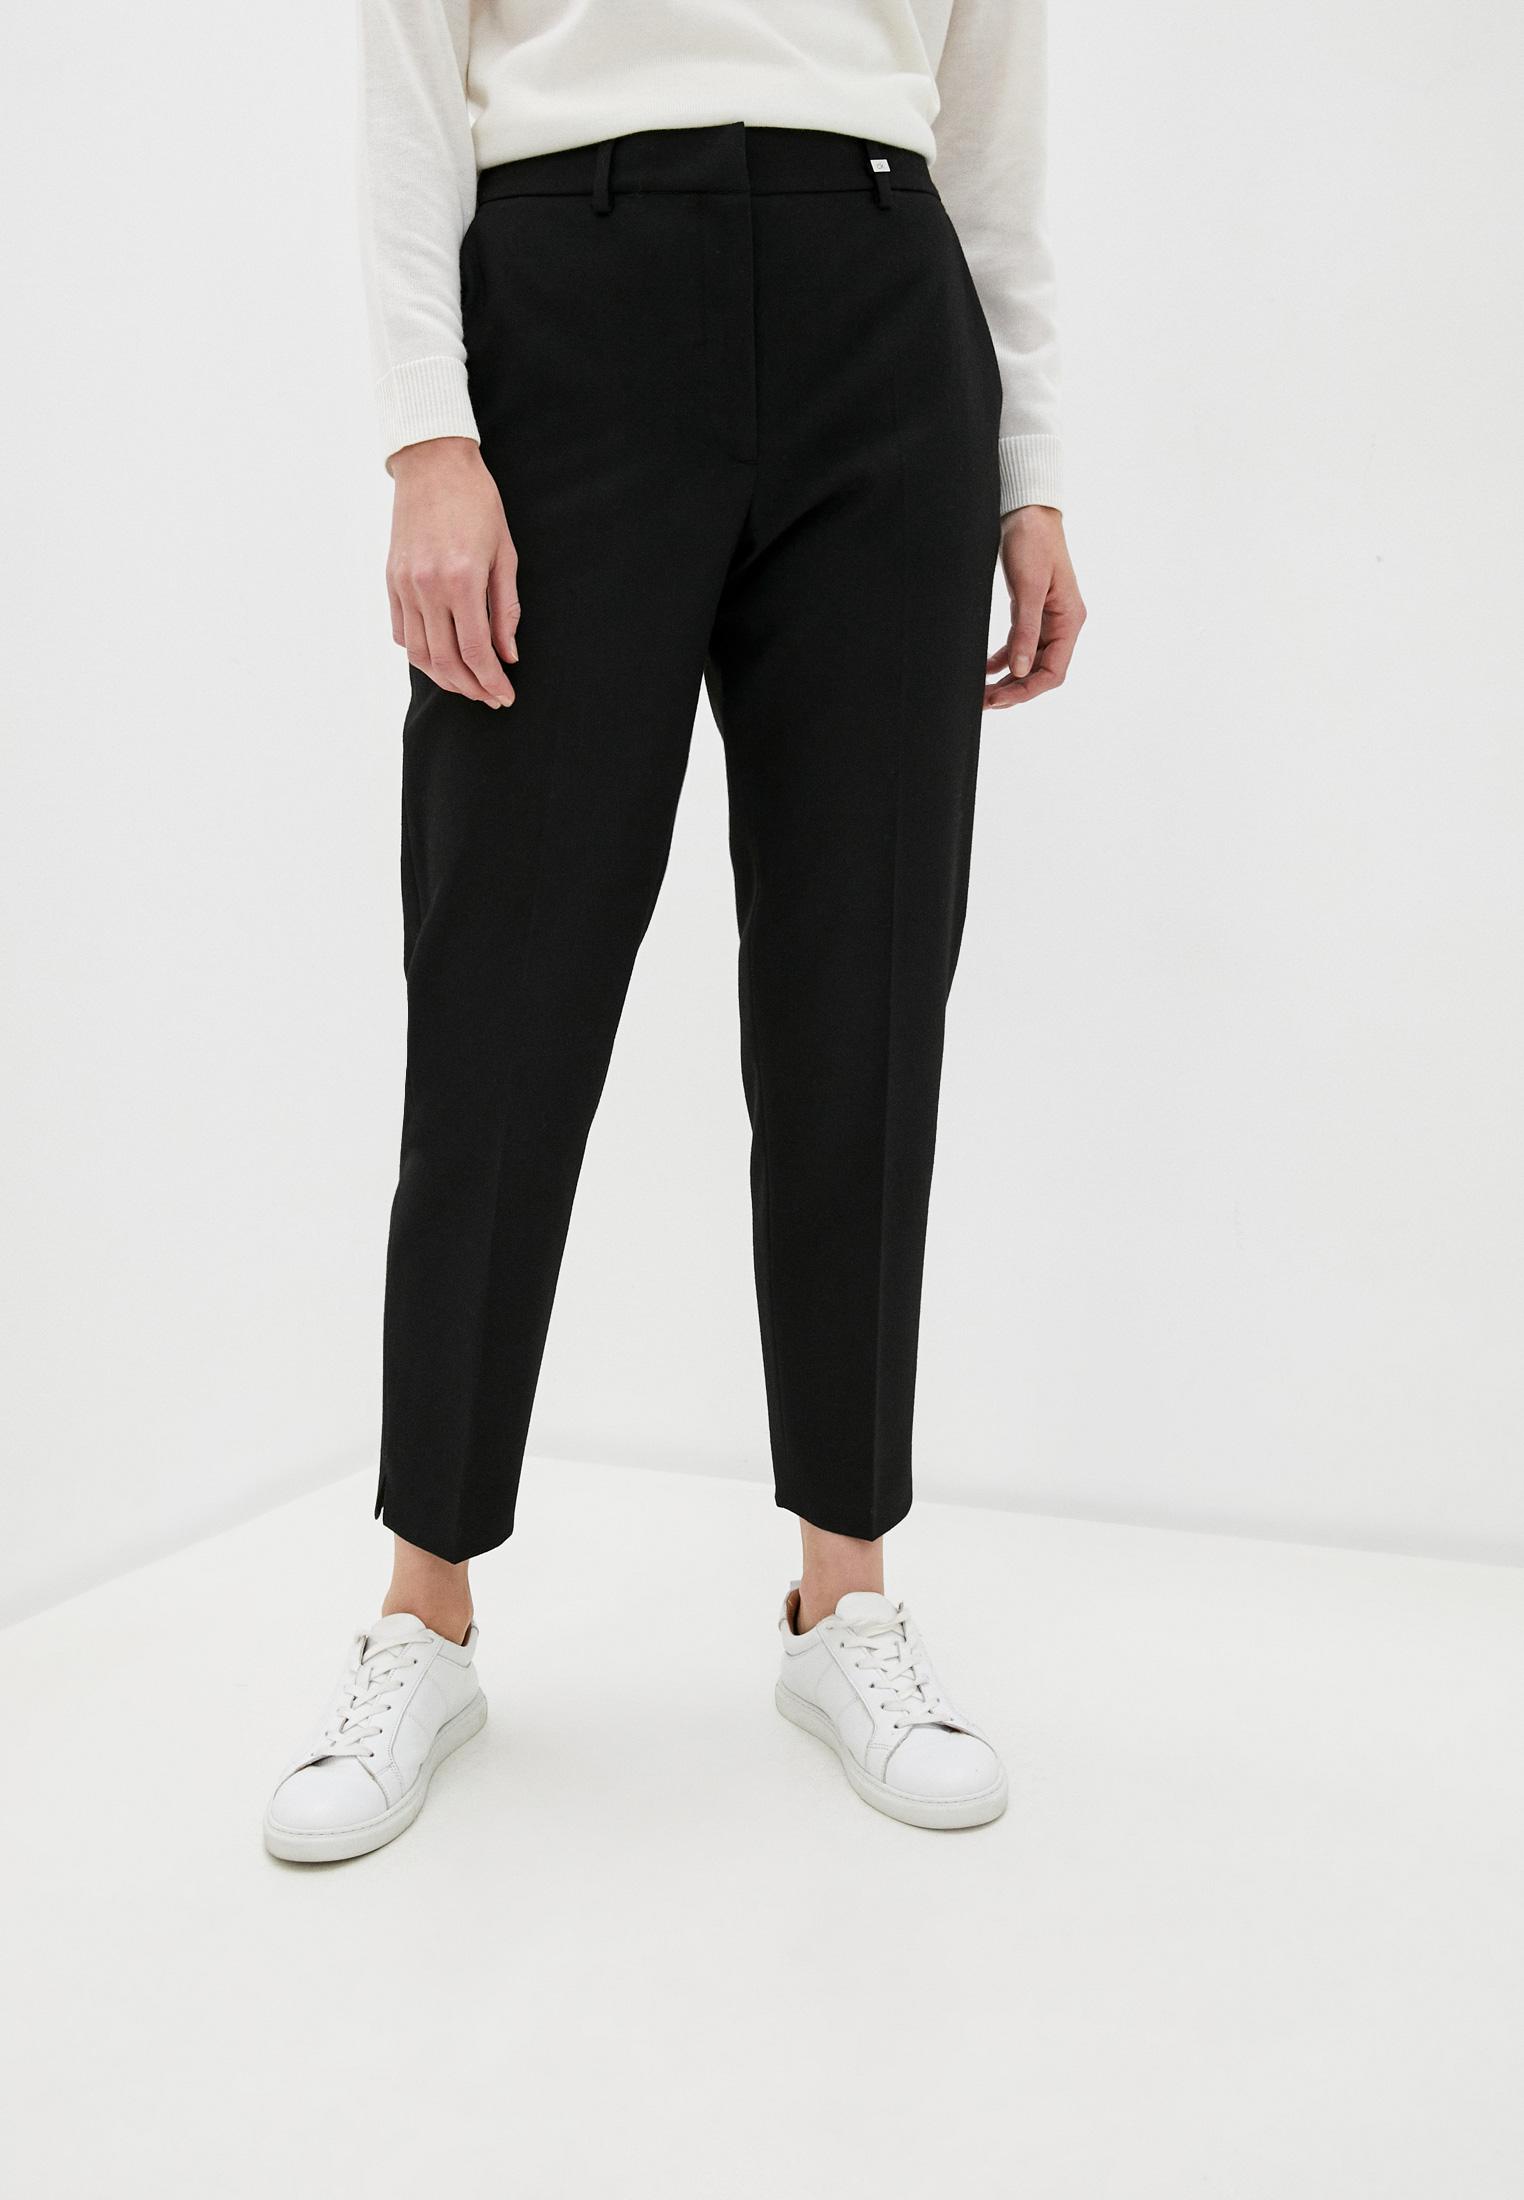 Женские классические брюки Calvin Klein (Кельвин Кляйн) K20K202306